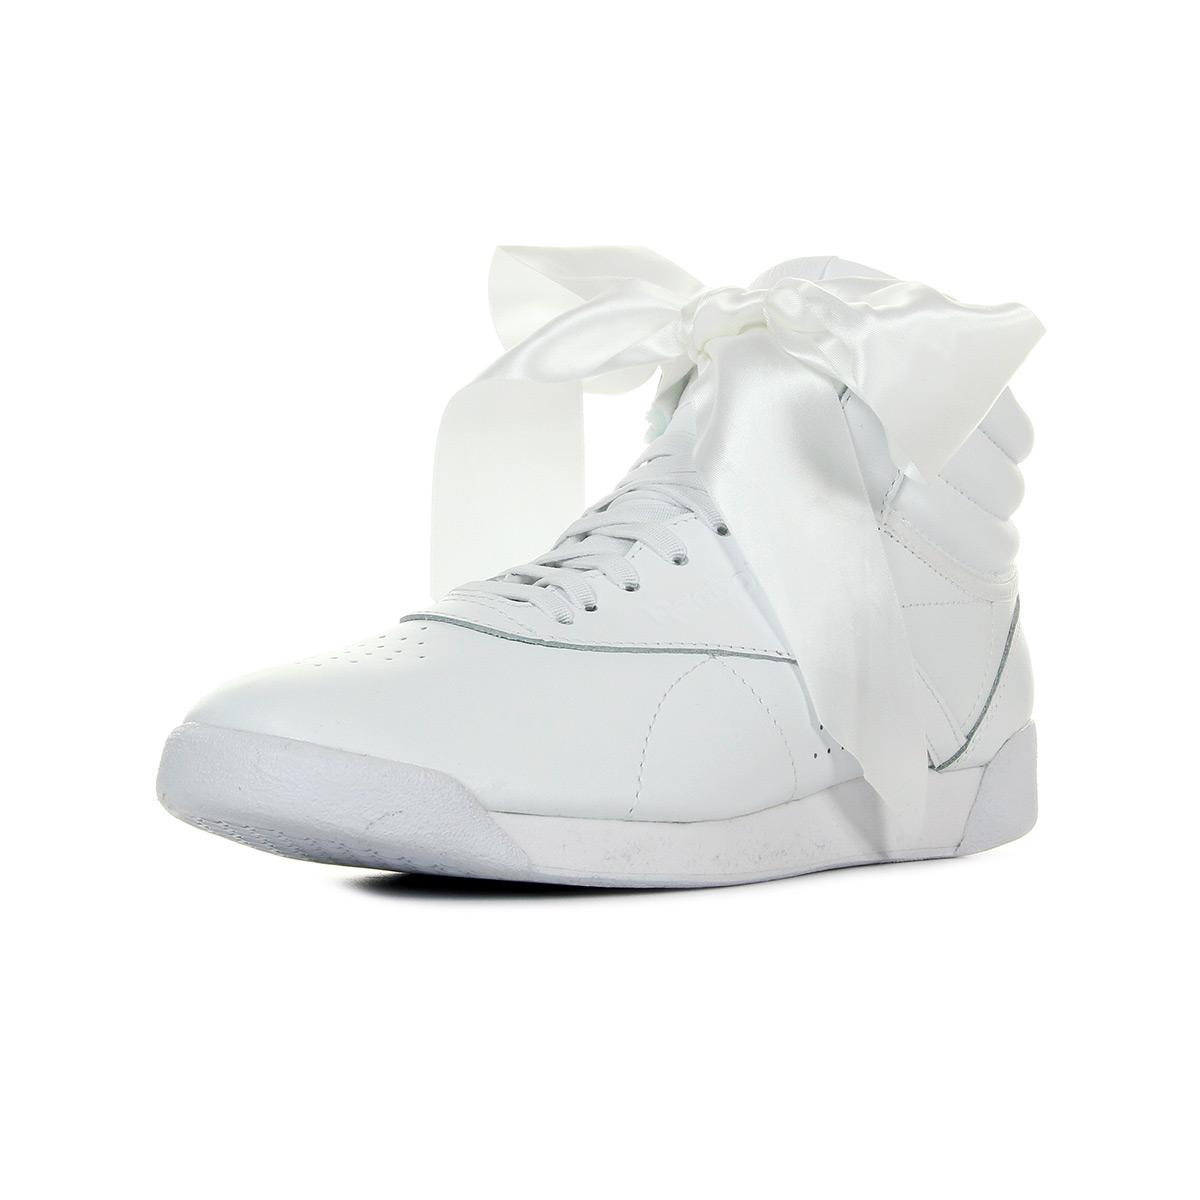 Reebok FS Hi Satin Bow CM8903, Baskets mode femme